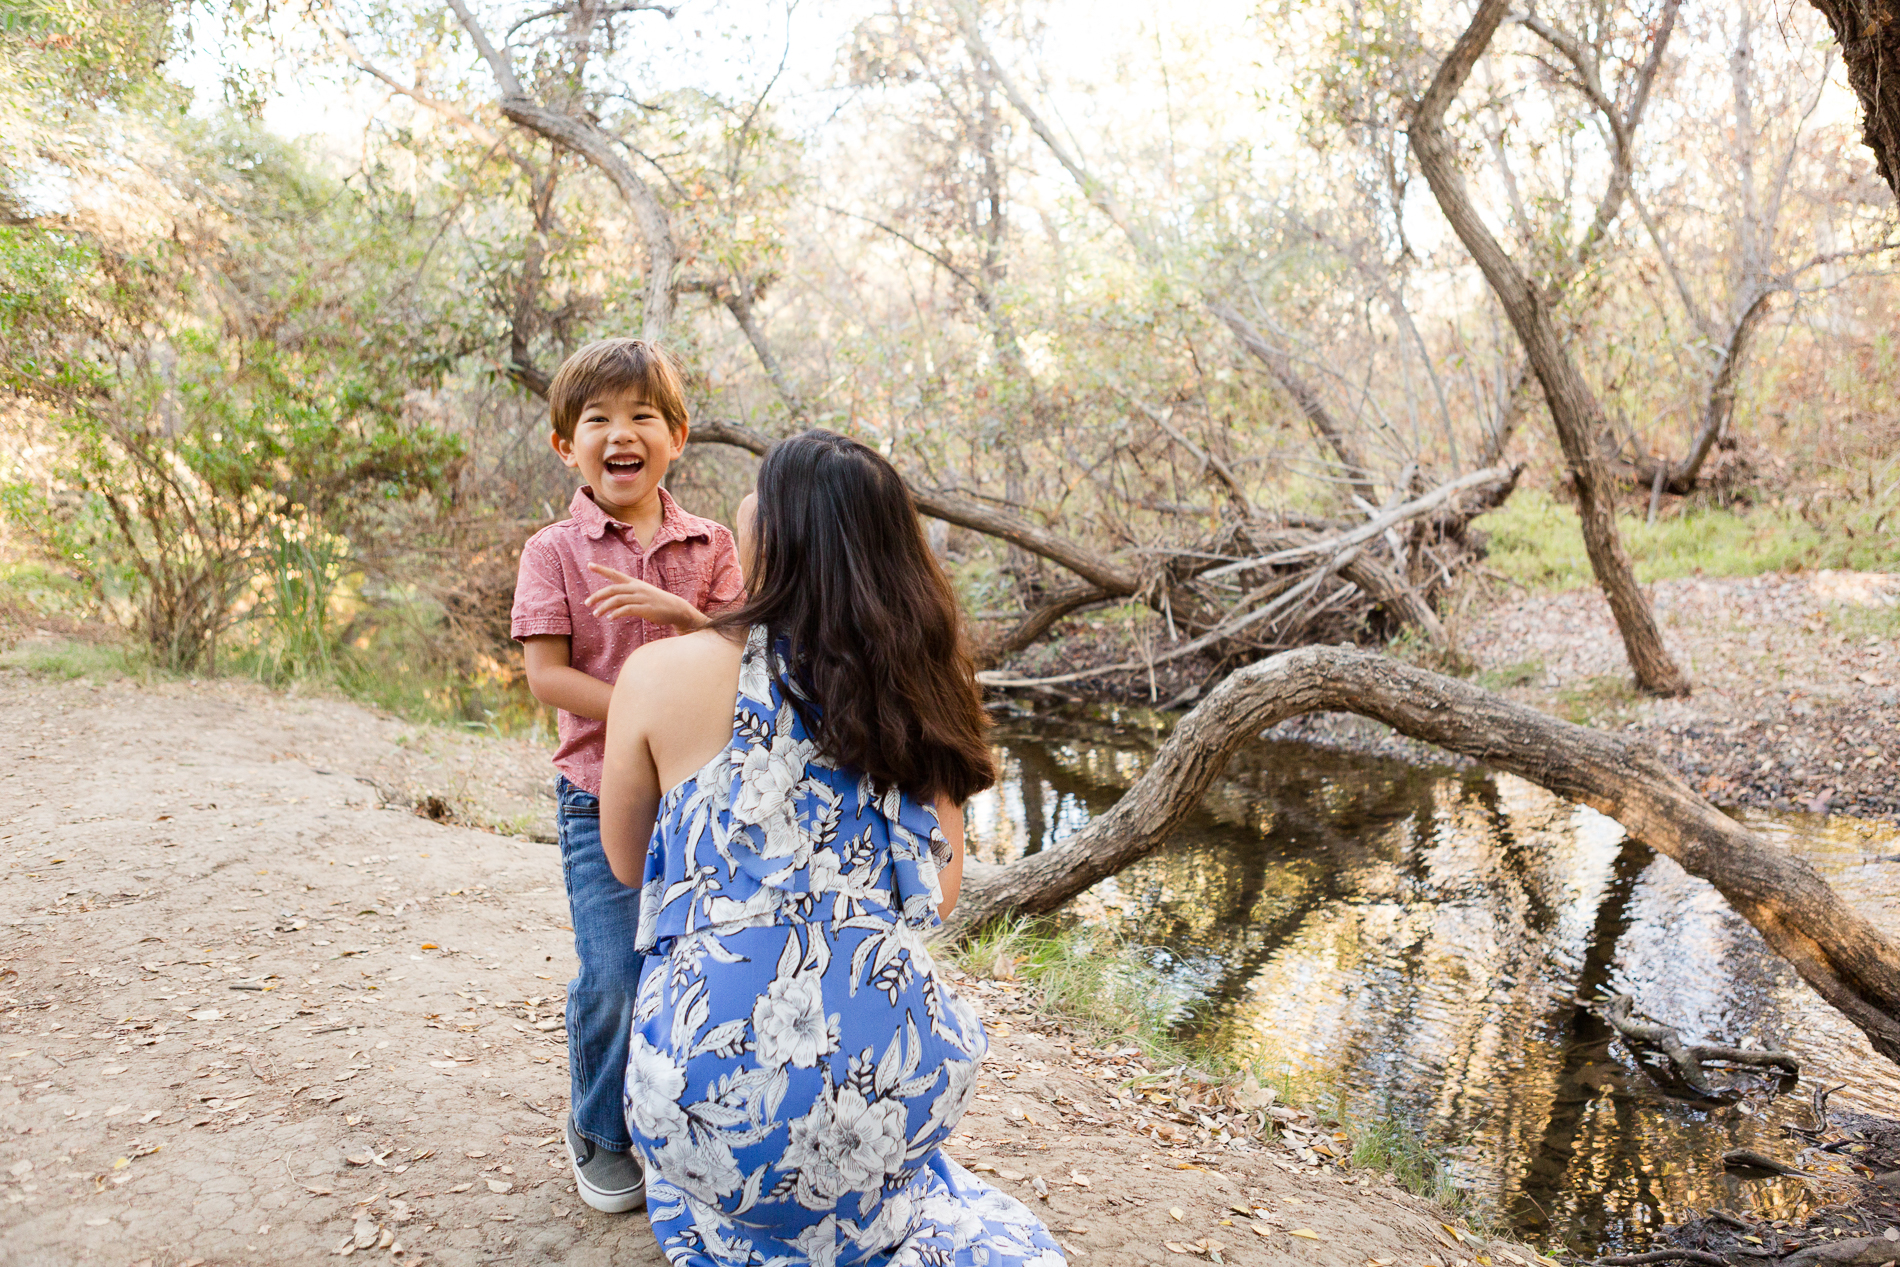 San Diego Family Photographer Los Penasquitos Canyon Christine Dammann Photography-23.jpg